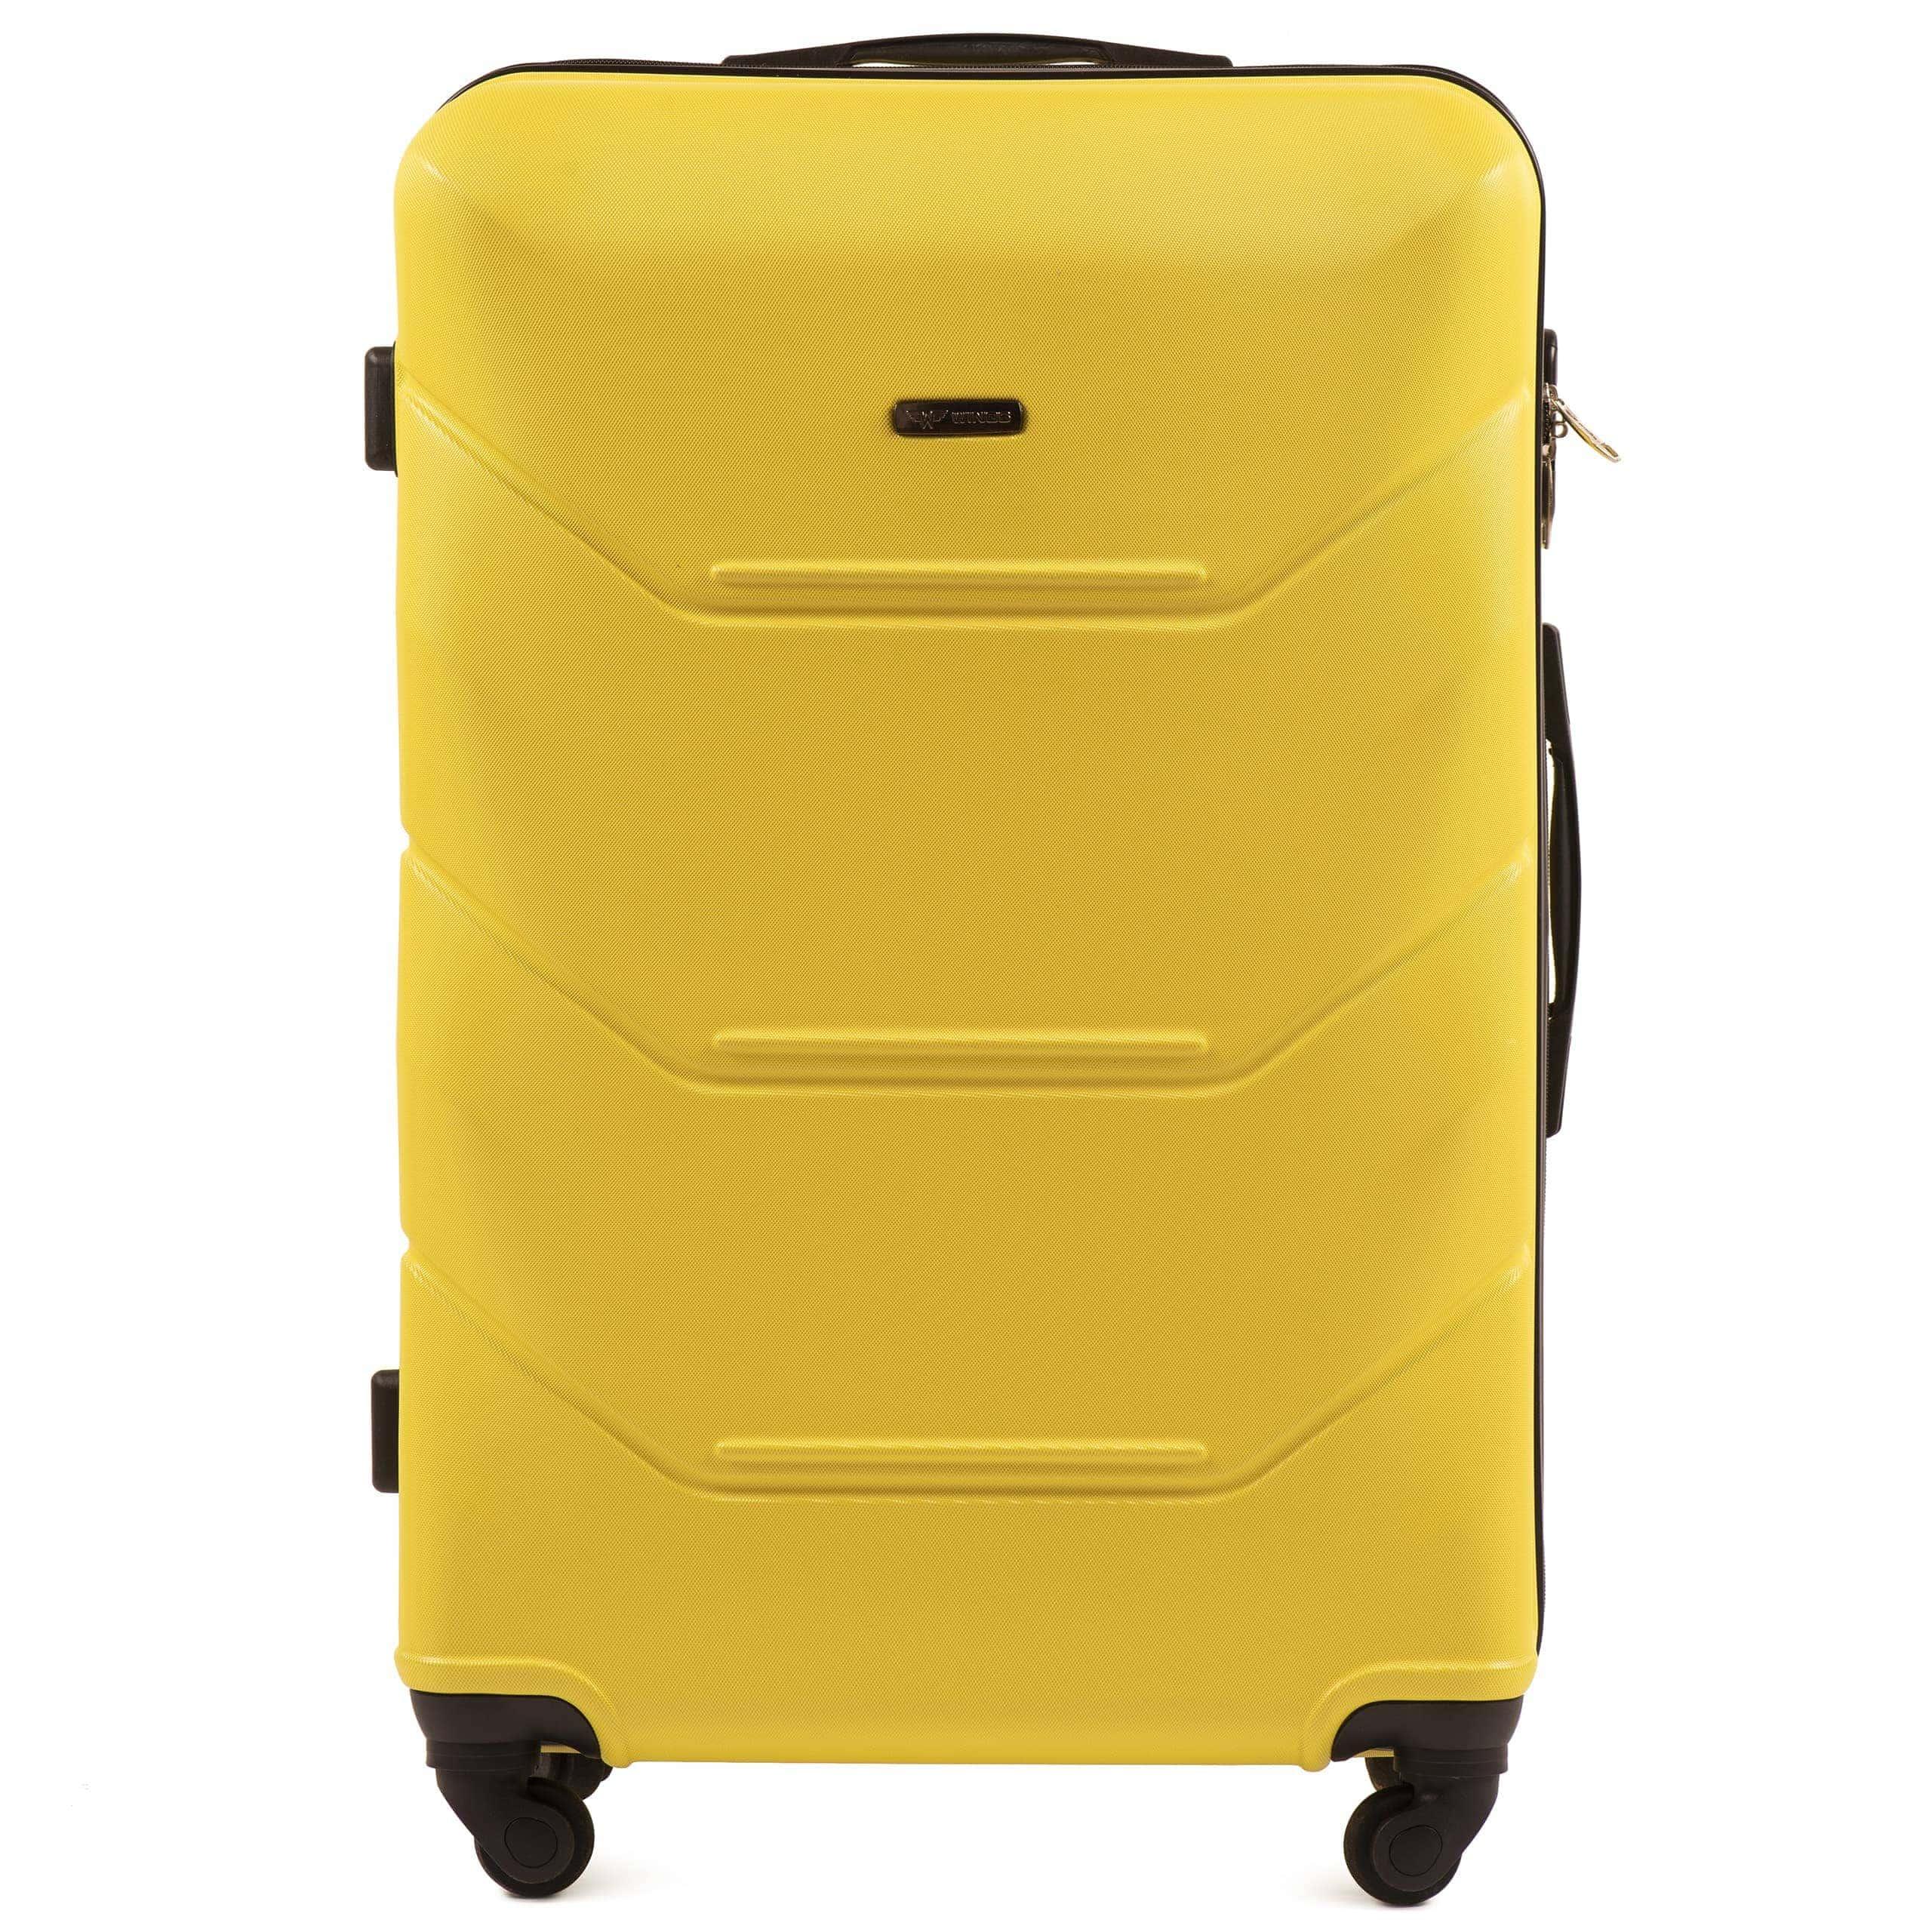 Valiza mare WINGS 147 L YELLOW Premium pe 4 roti din cauciuc!Pt bagaj,pina la 23 kg